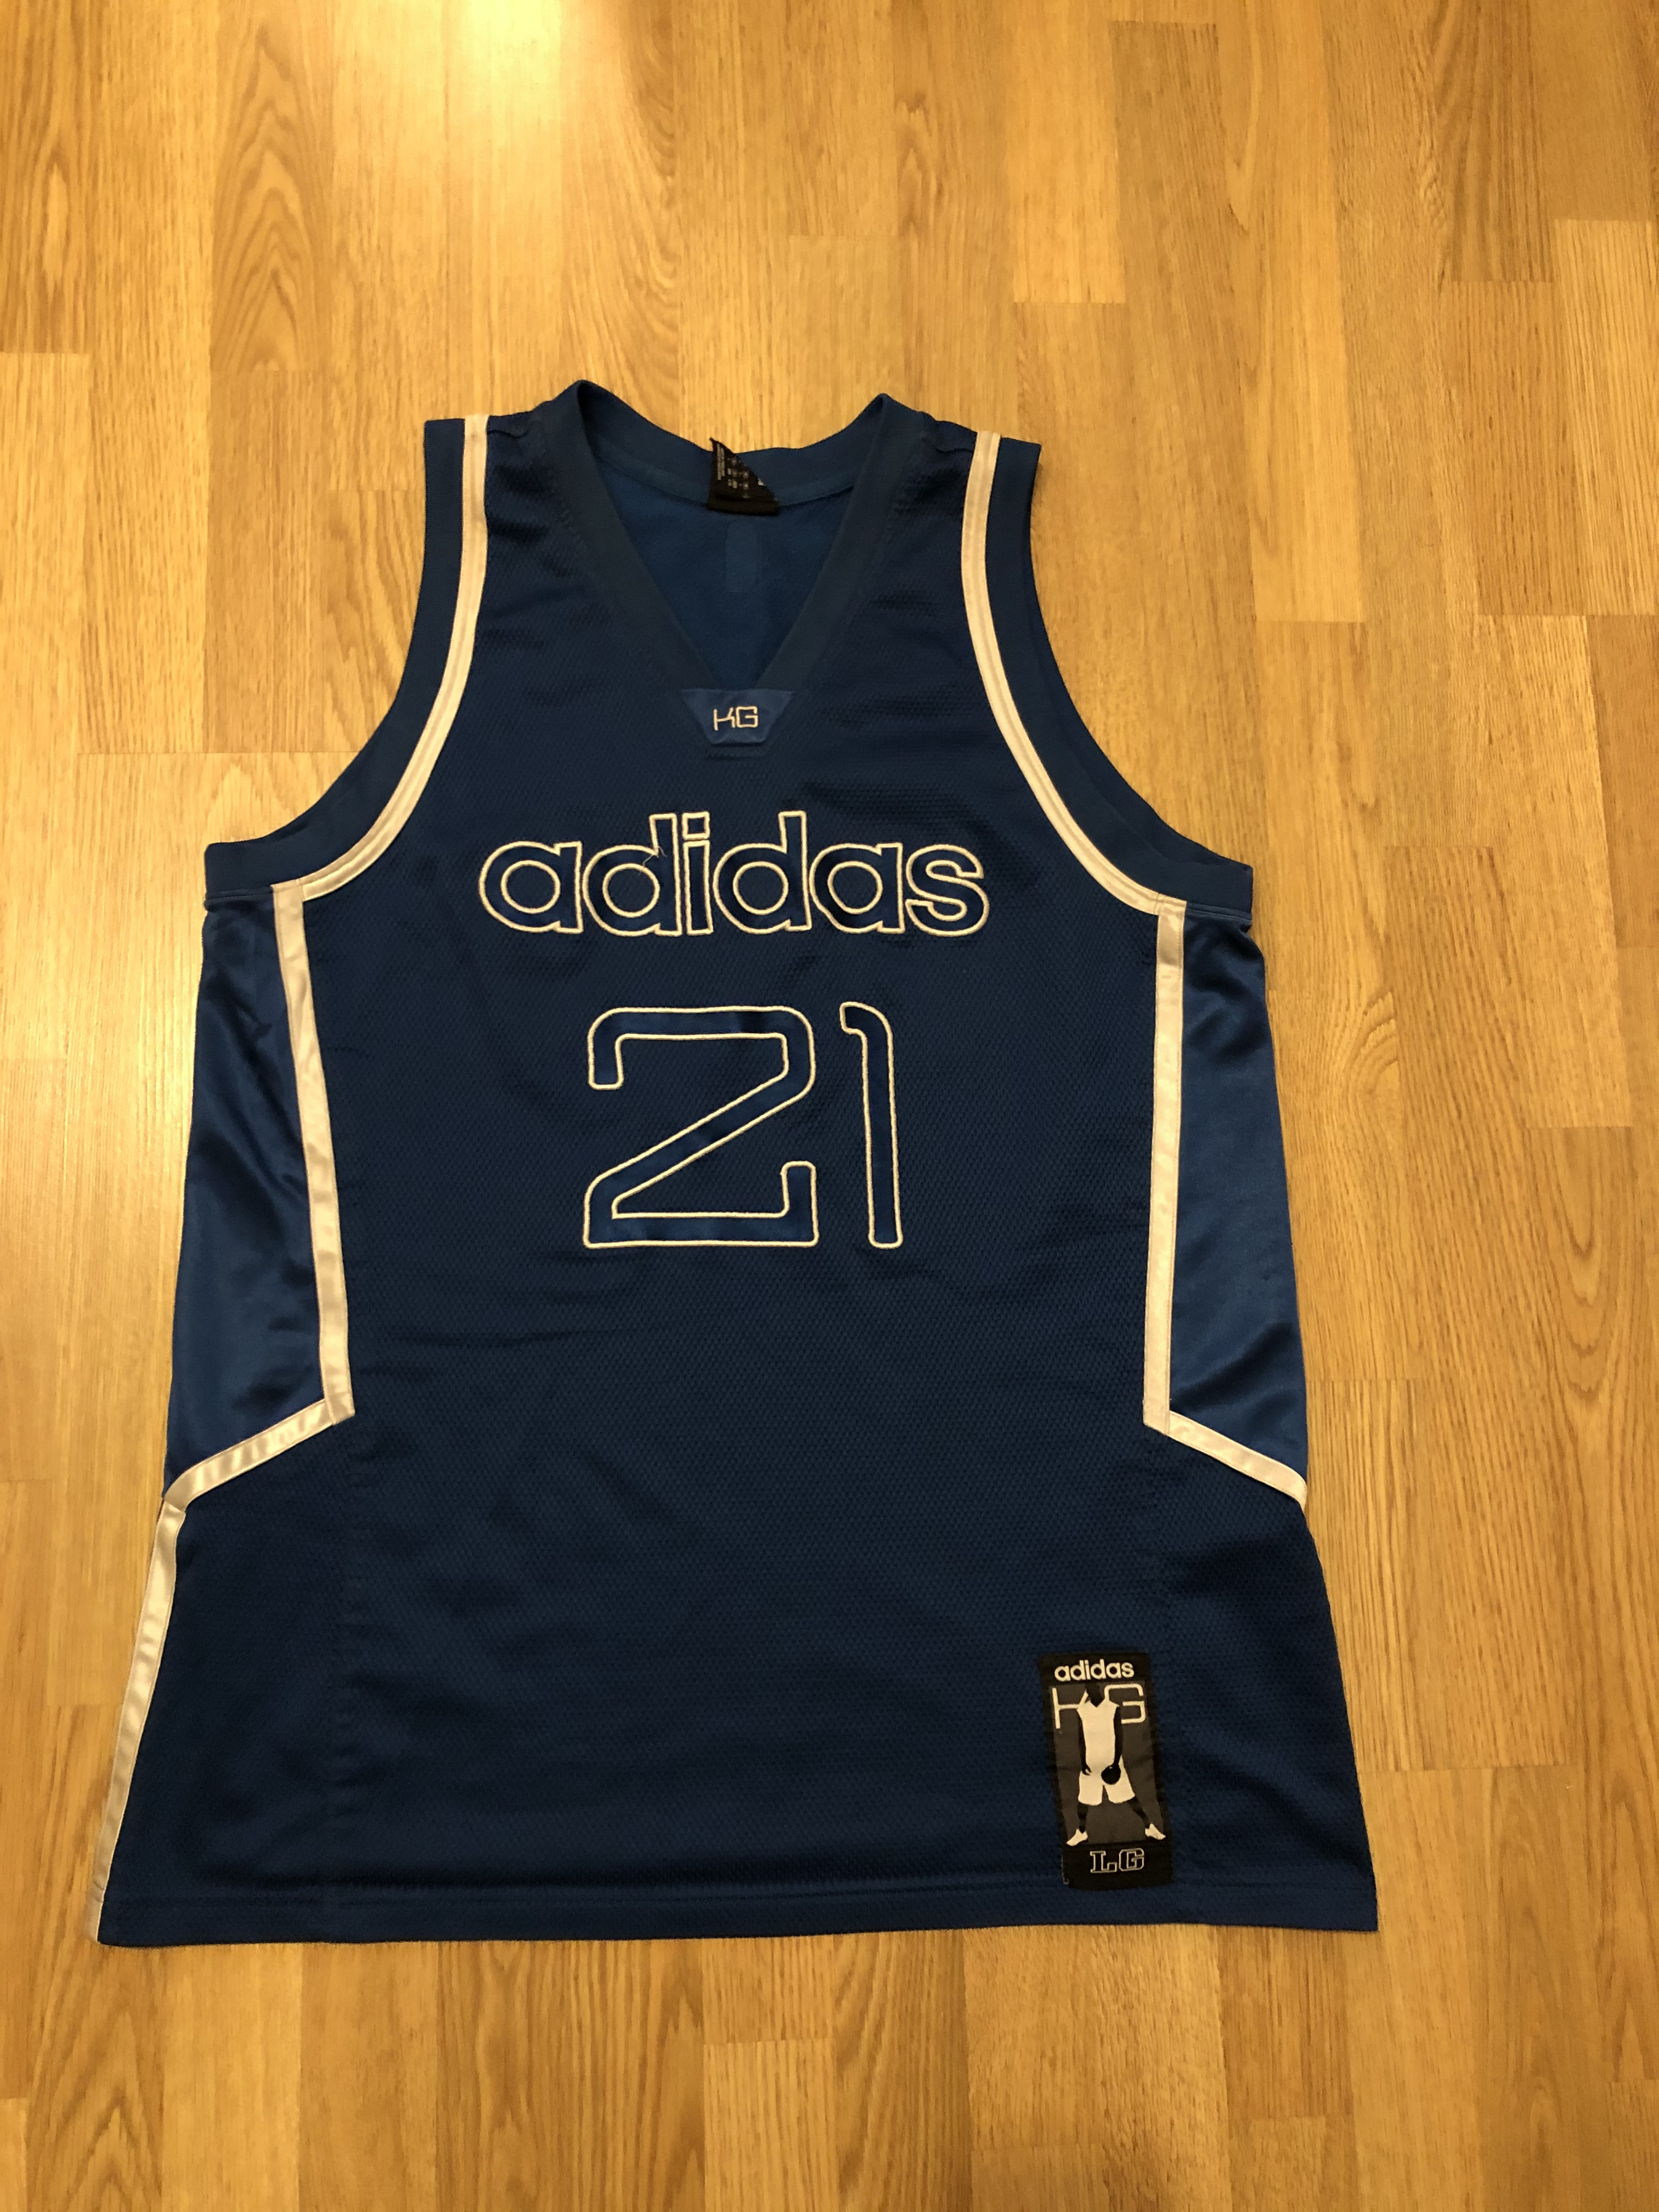 Adidas Vintage Kevin Garnett 21 Adidas Jersey NBA Size L